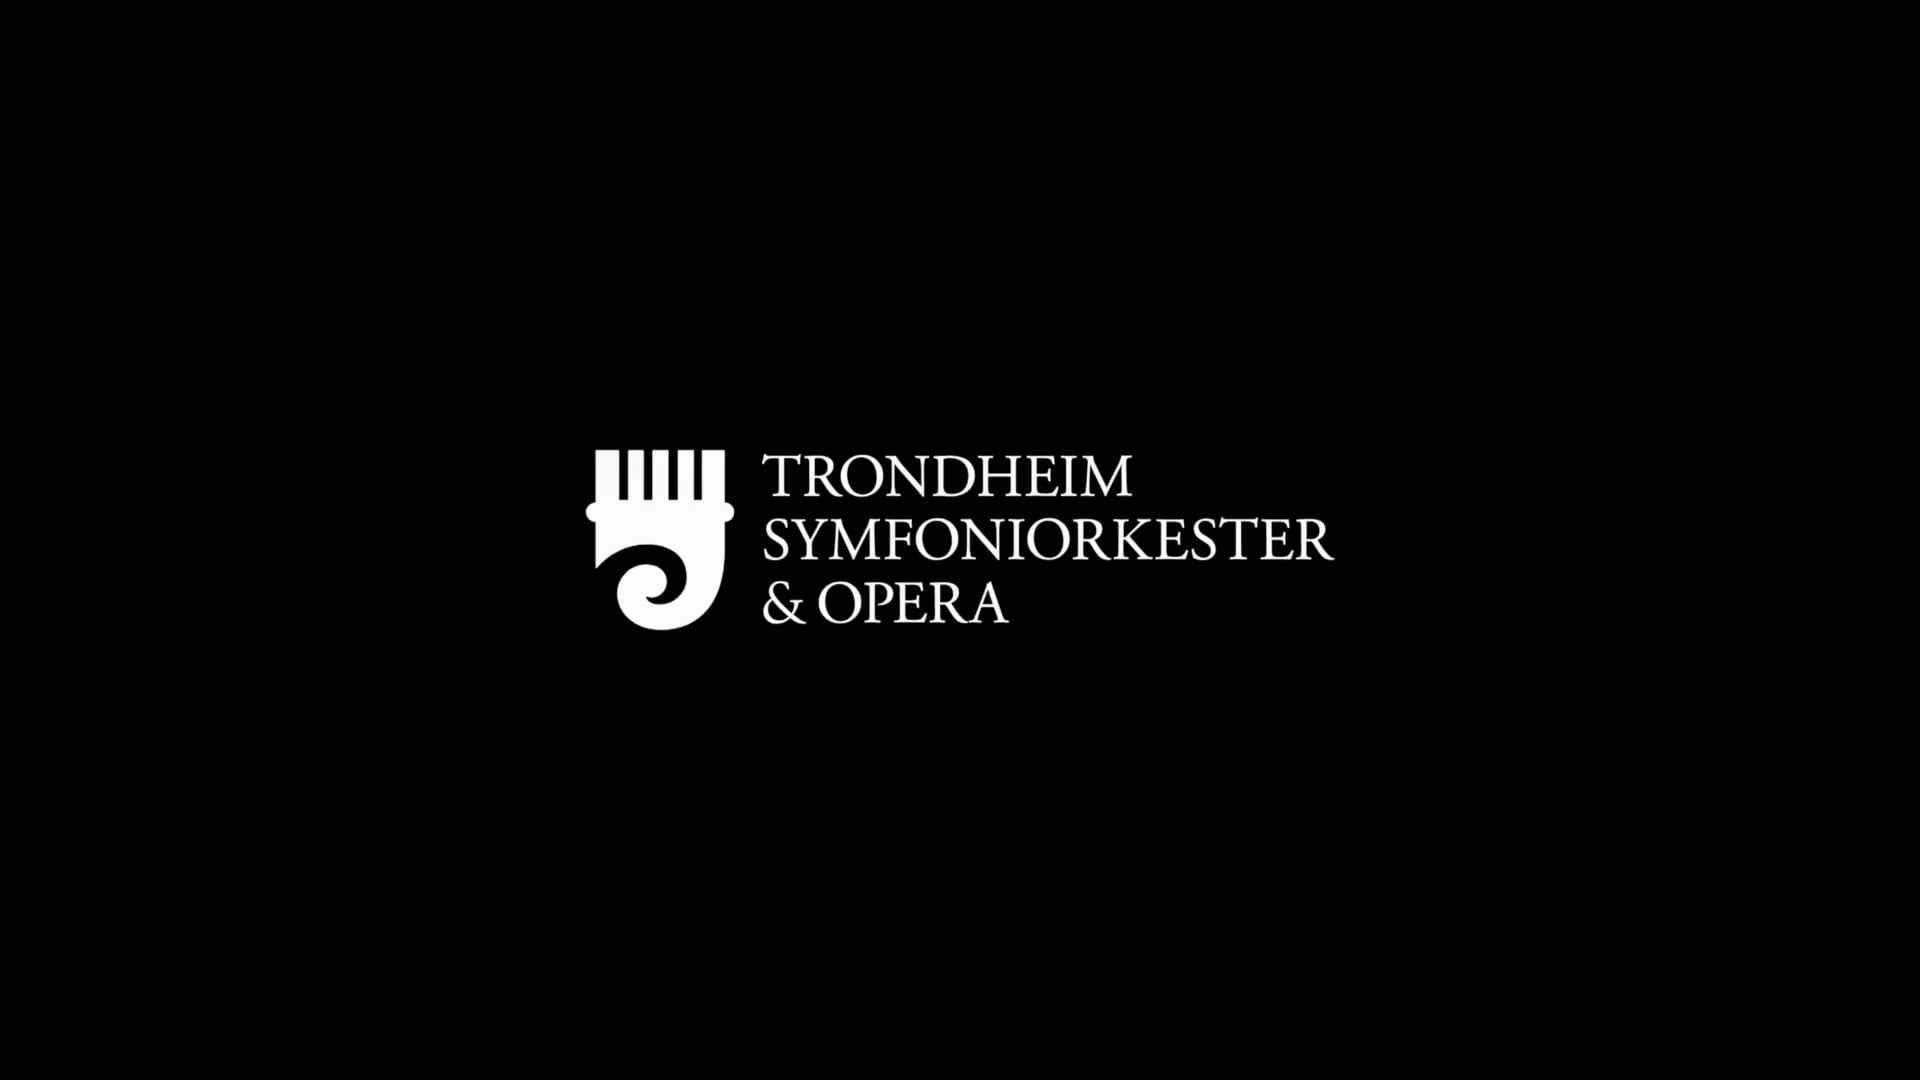 Trondheim Symfoniorkester & Opera: Intro Han-Na Chang